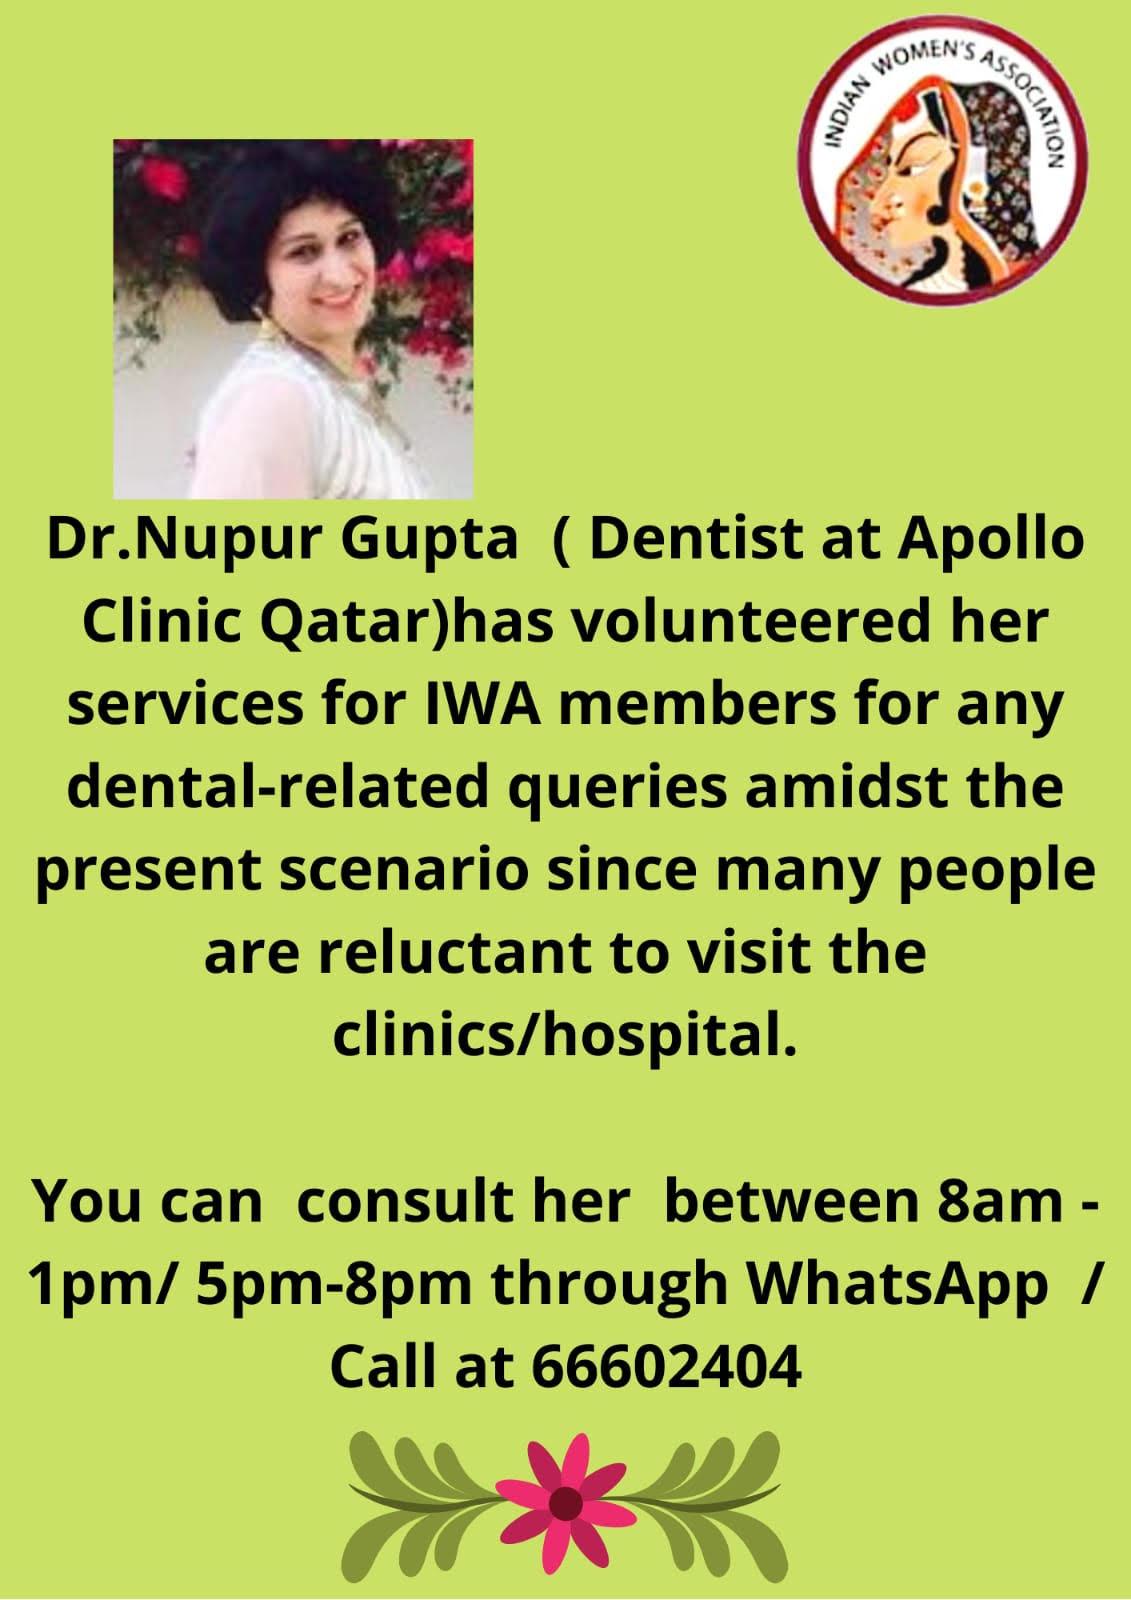 Dr.Nupur Gupta's (Dentist) Volunteered her Services for IWA Members